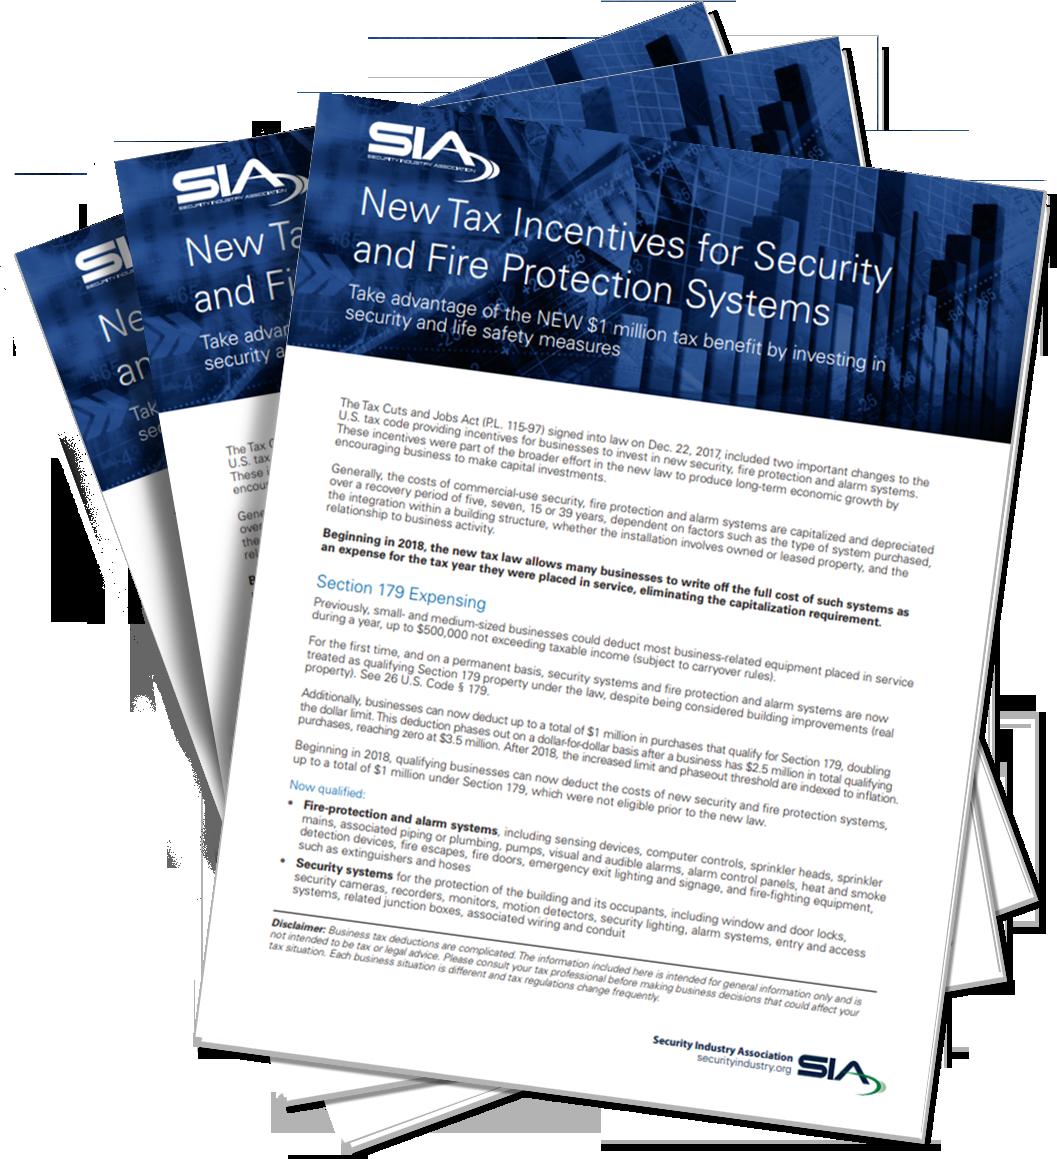 SIA 2018 Tax Factsheet image magazine version